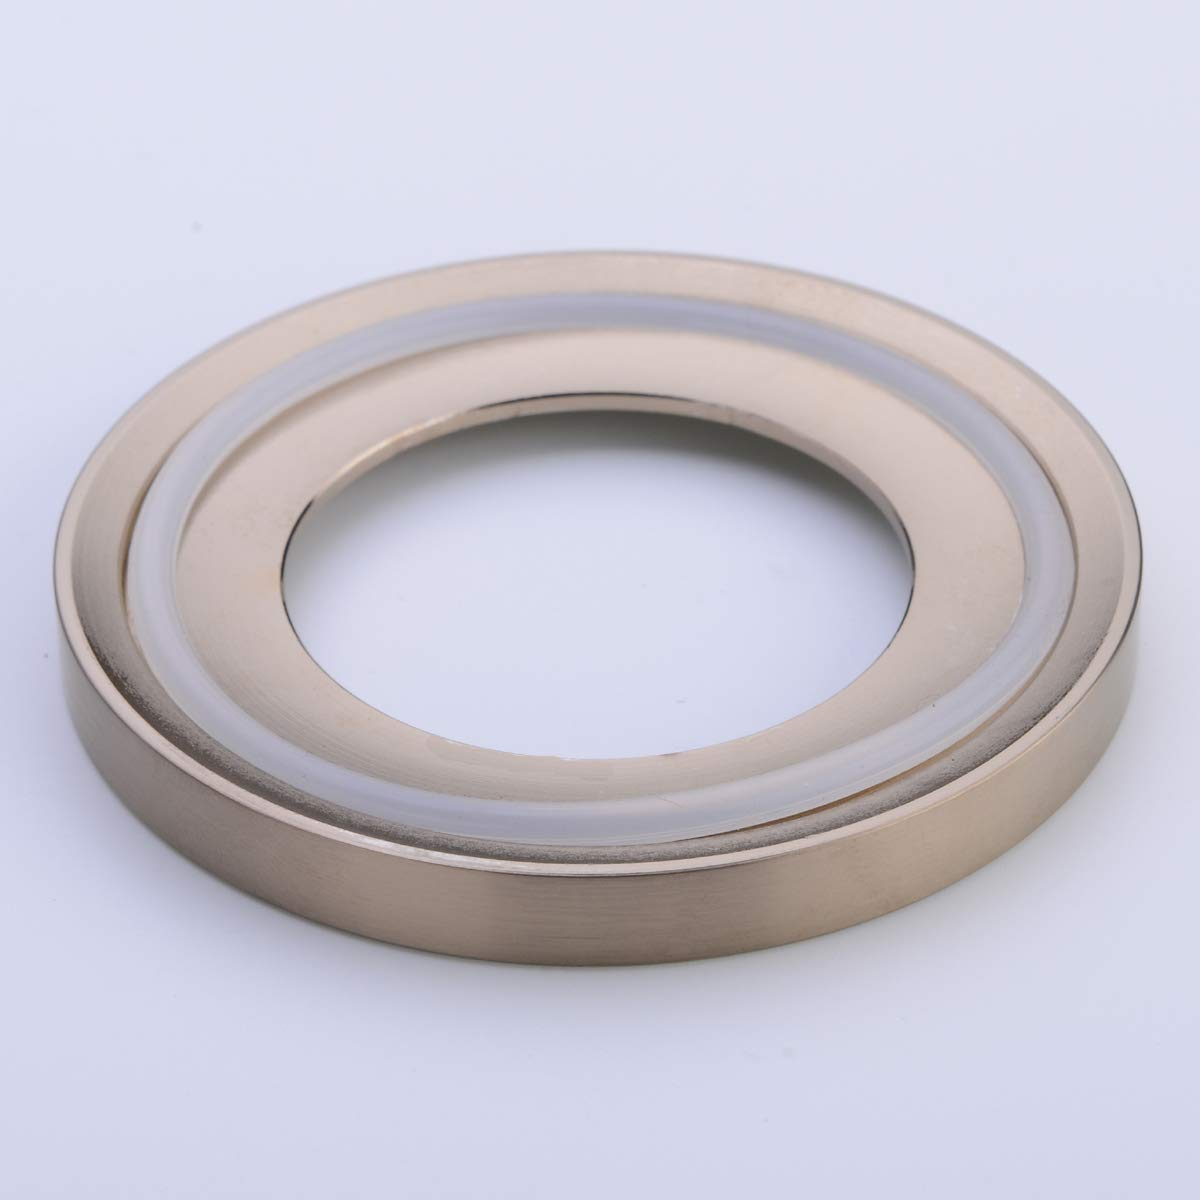 BESTILL Brass Bathroom Mounting Ring for Vessel Sink Matte Black